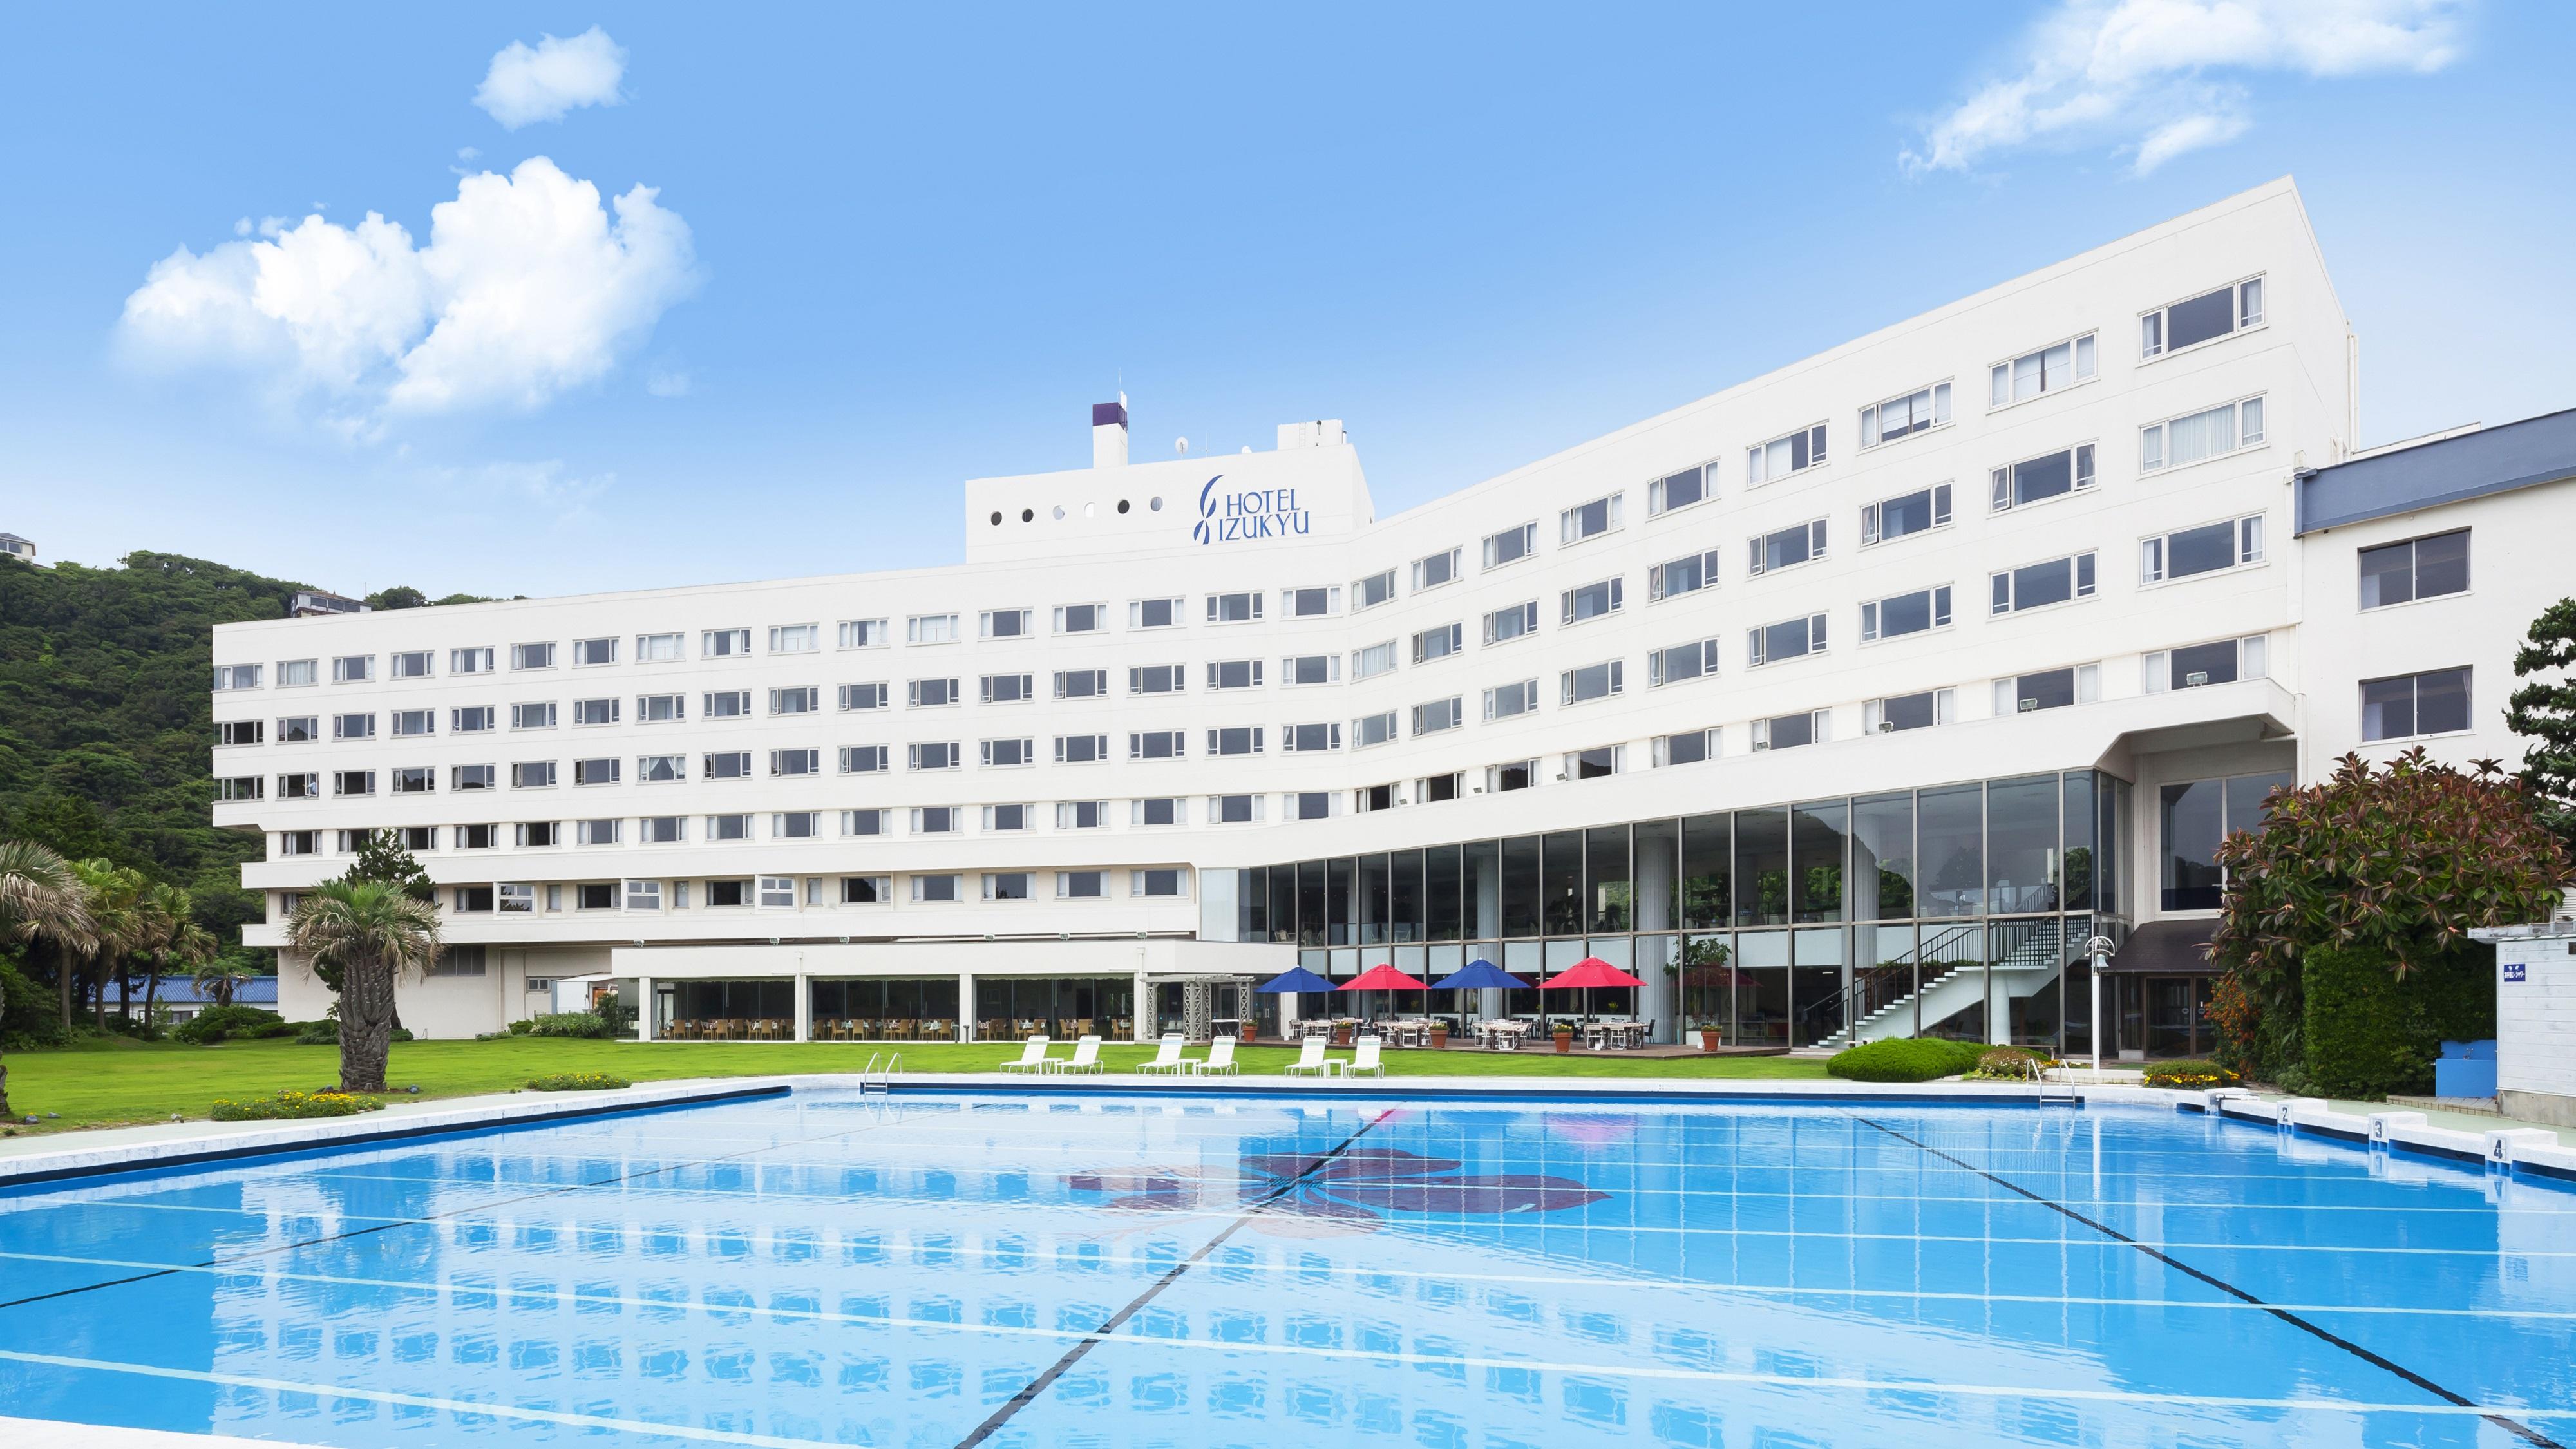 ホテル伊豆急